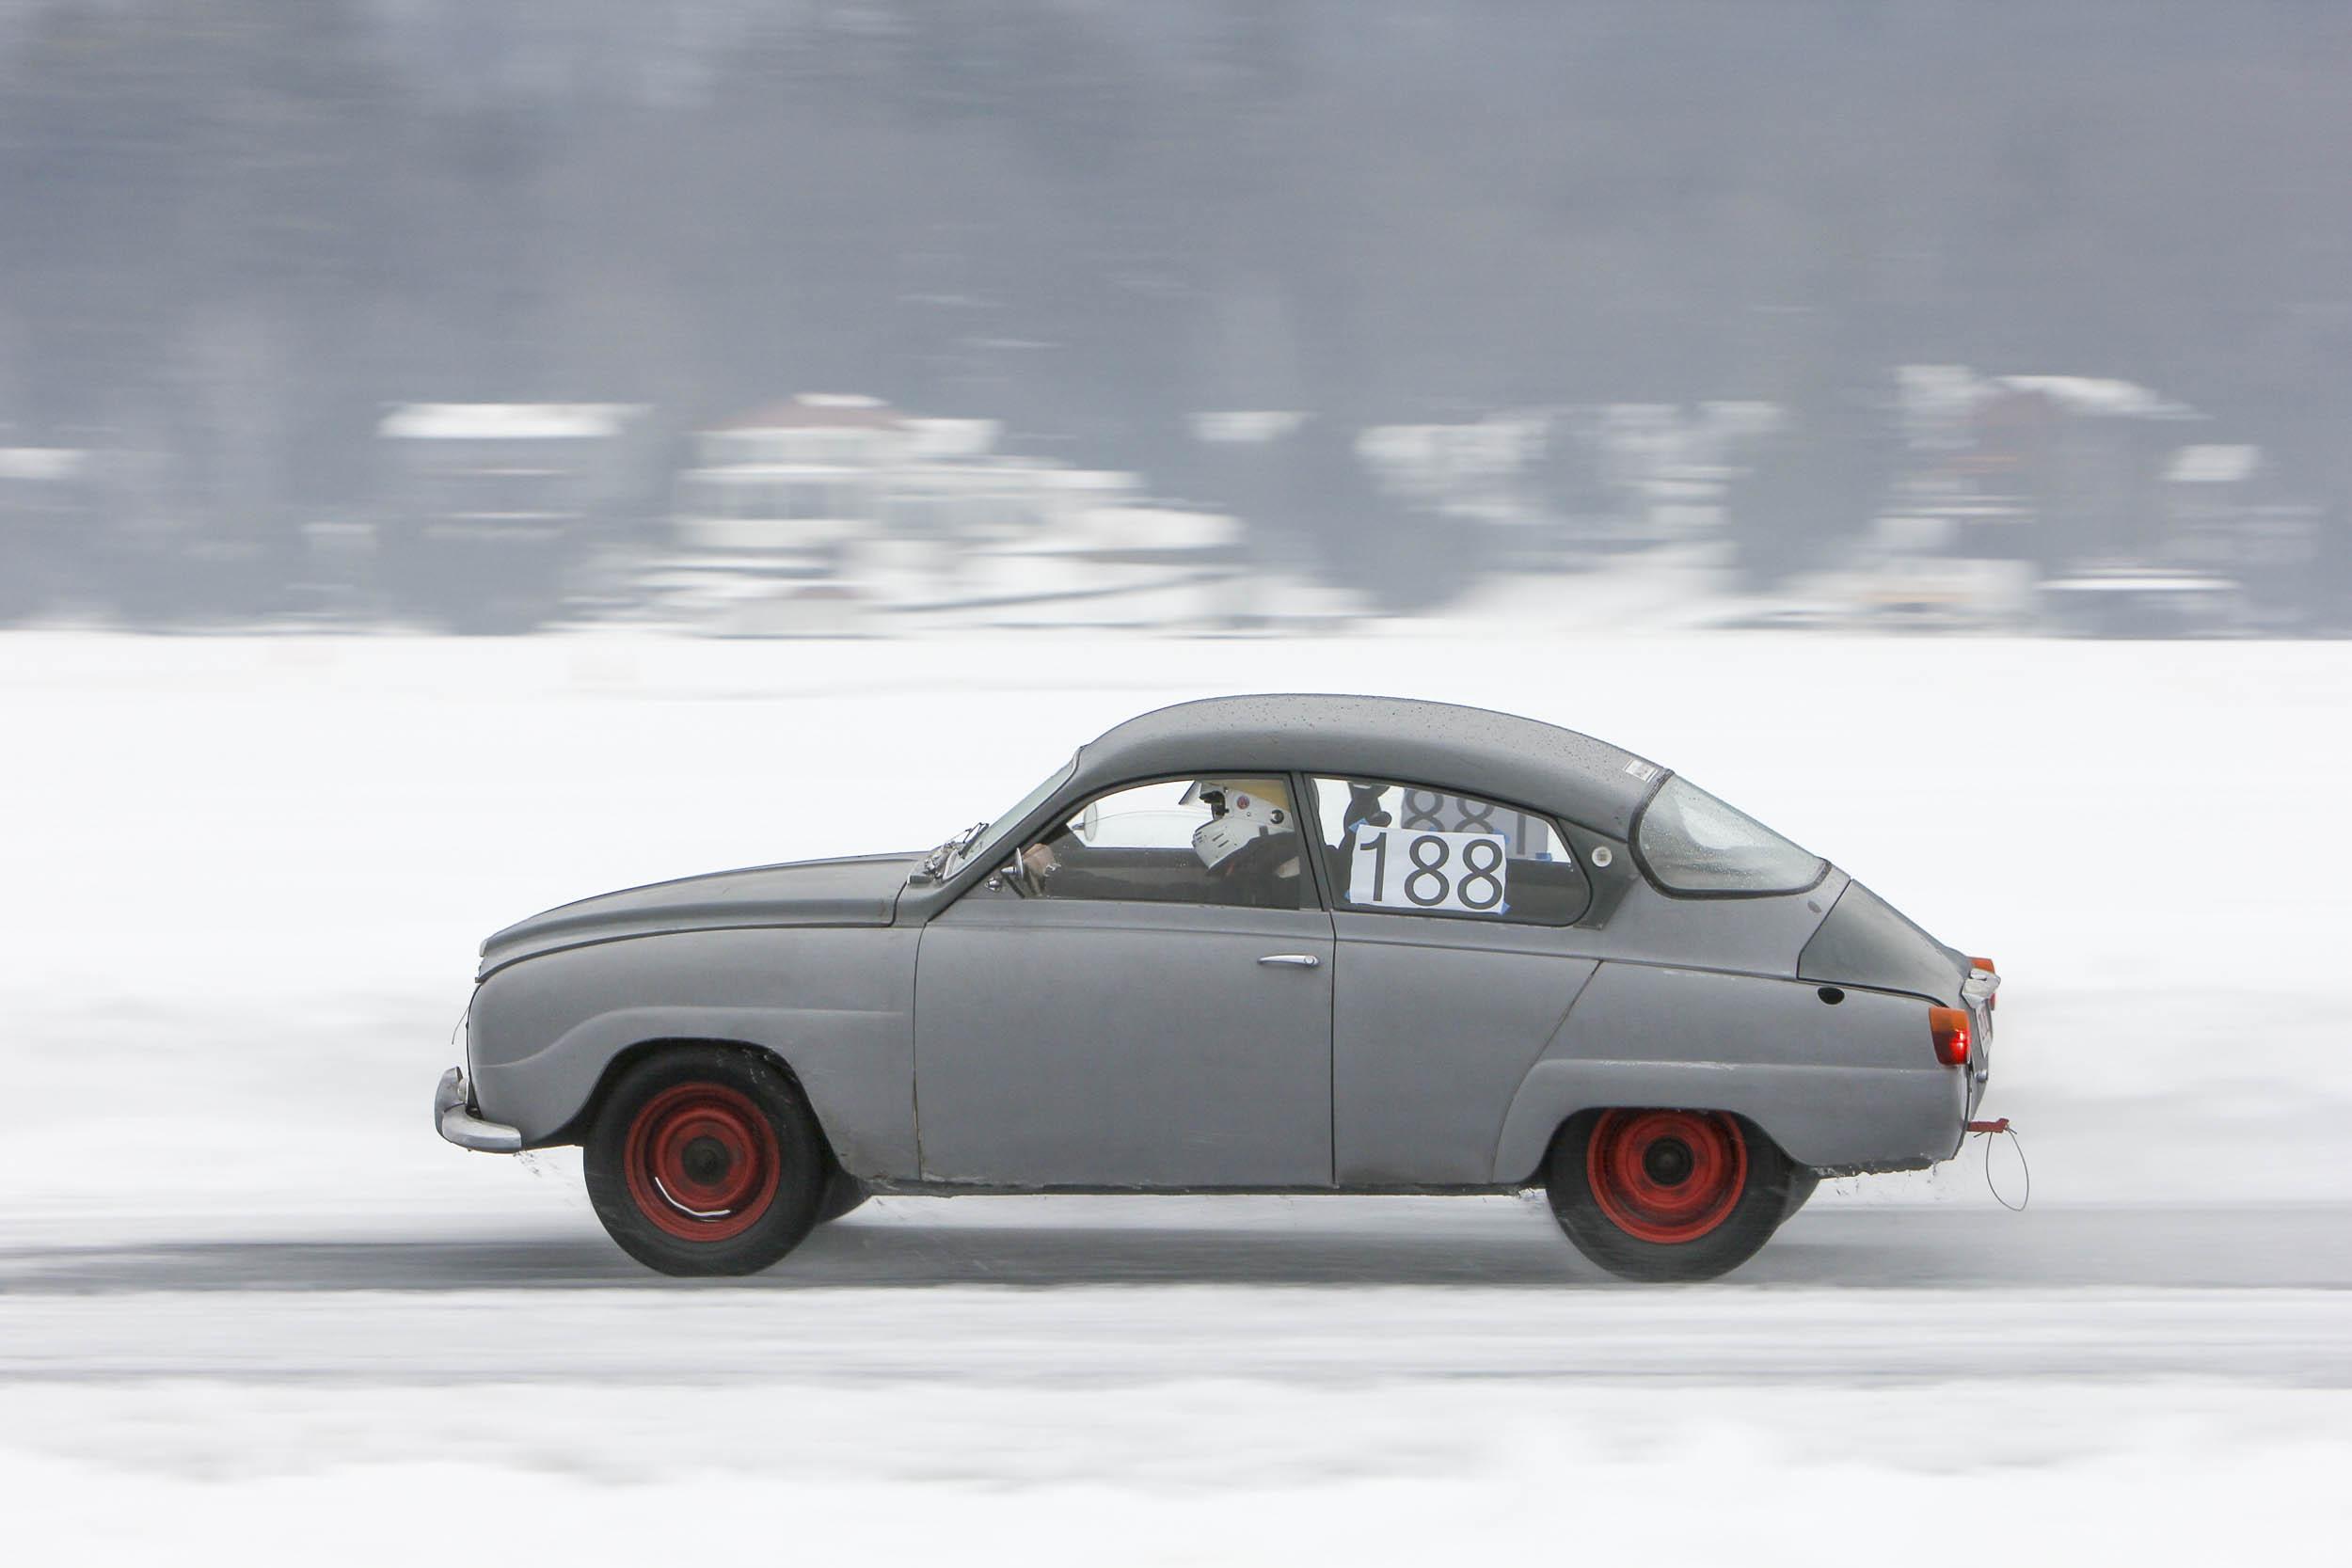 car speeding on ice